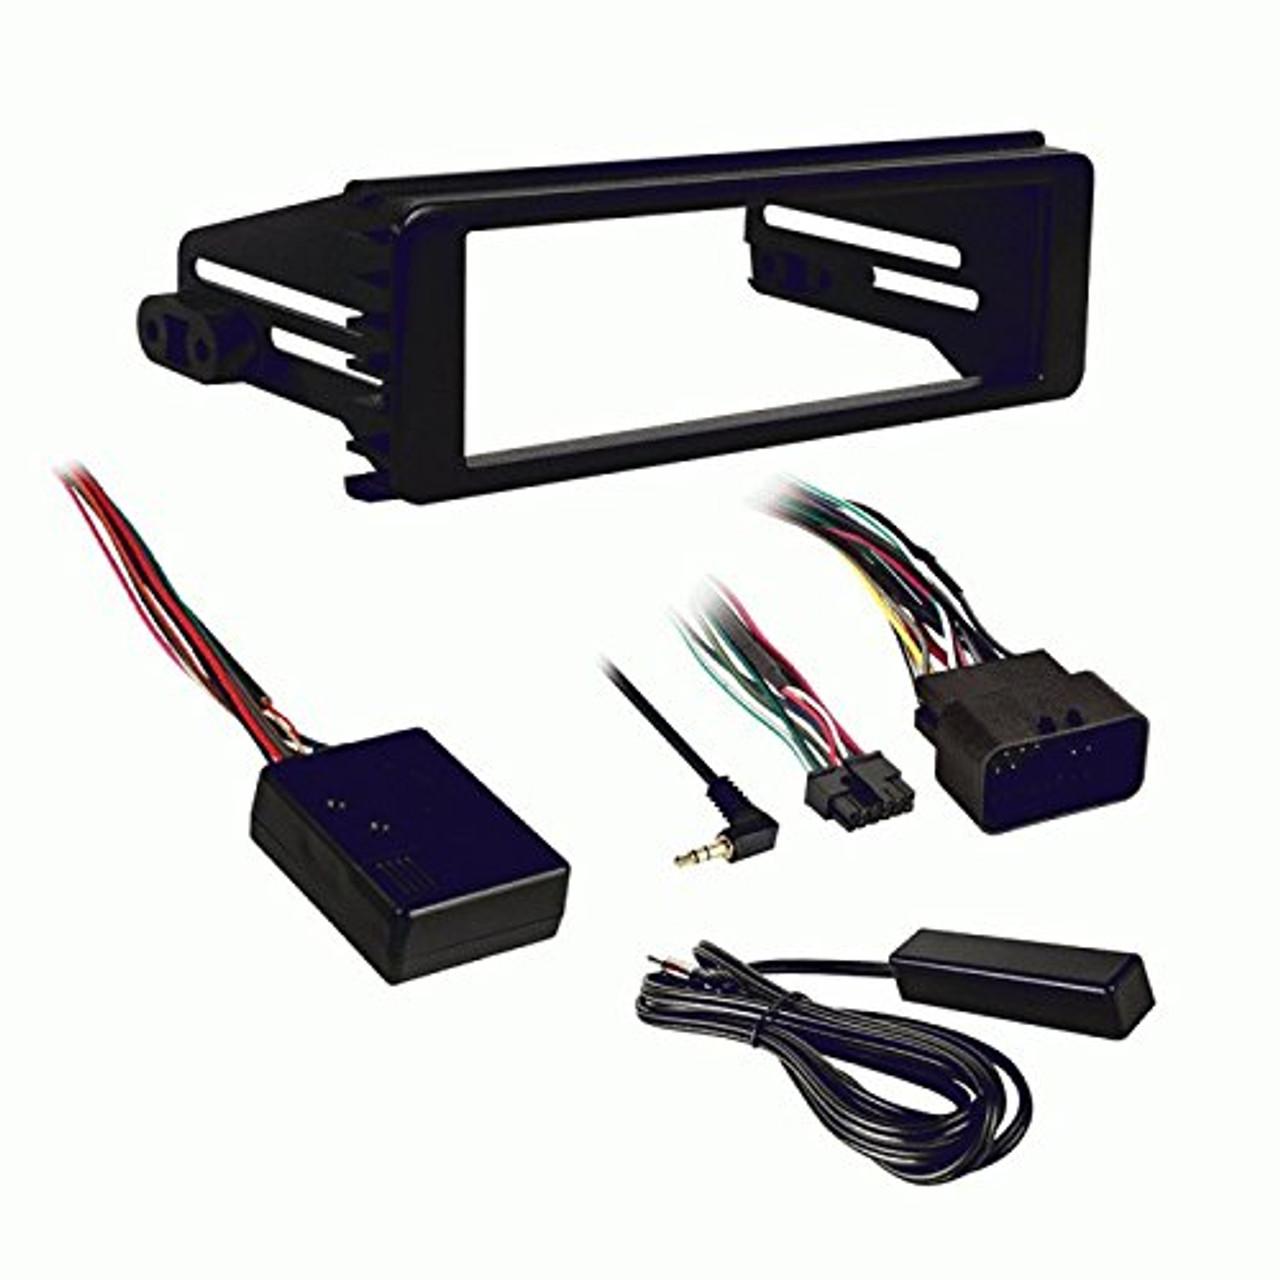 Metra 99-9613 1998-2013 Harley Davidson Stereo Install Kit w/ Handlebar on